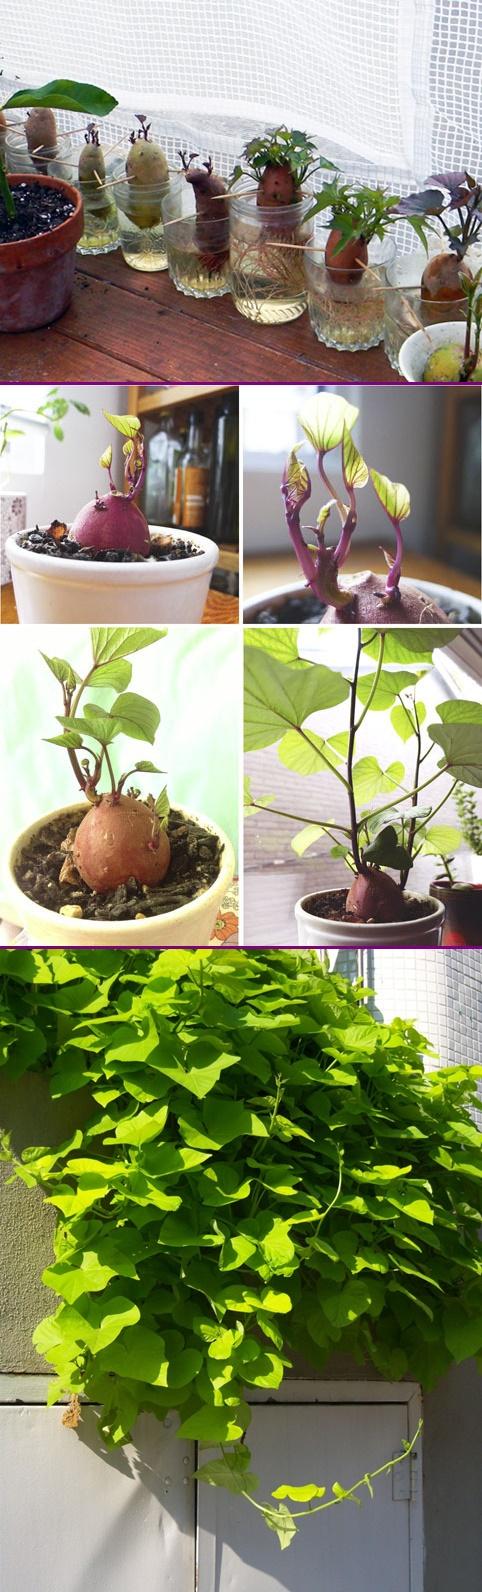 How to Grow Sweet Potato Vine Plant